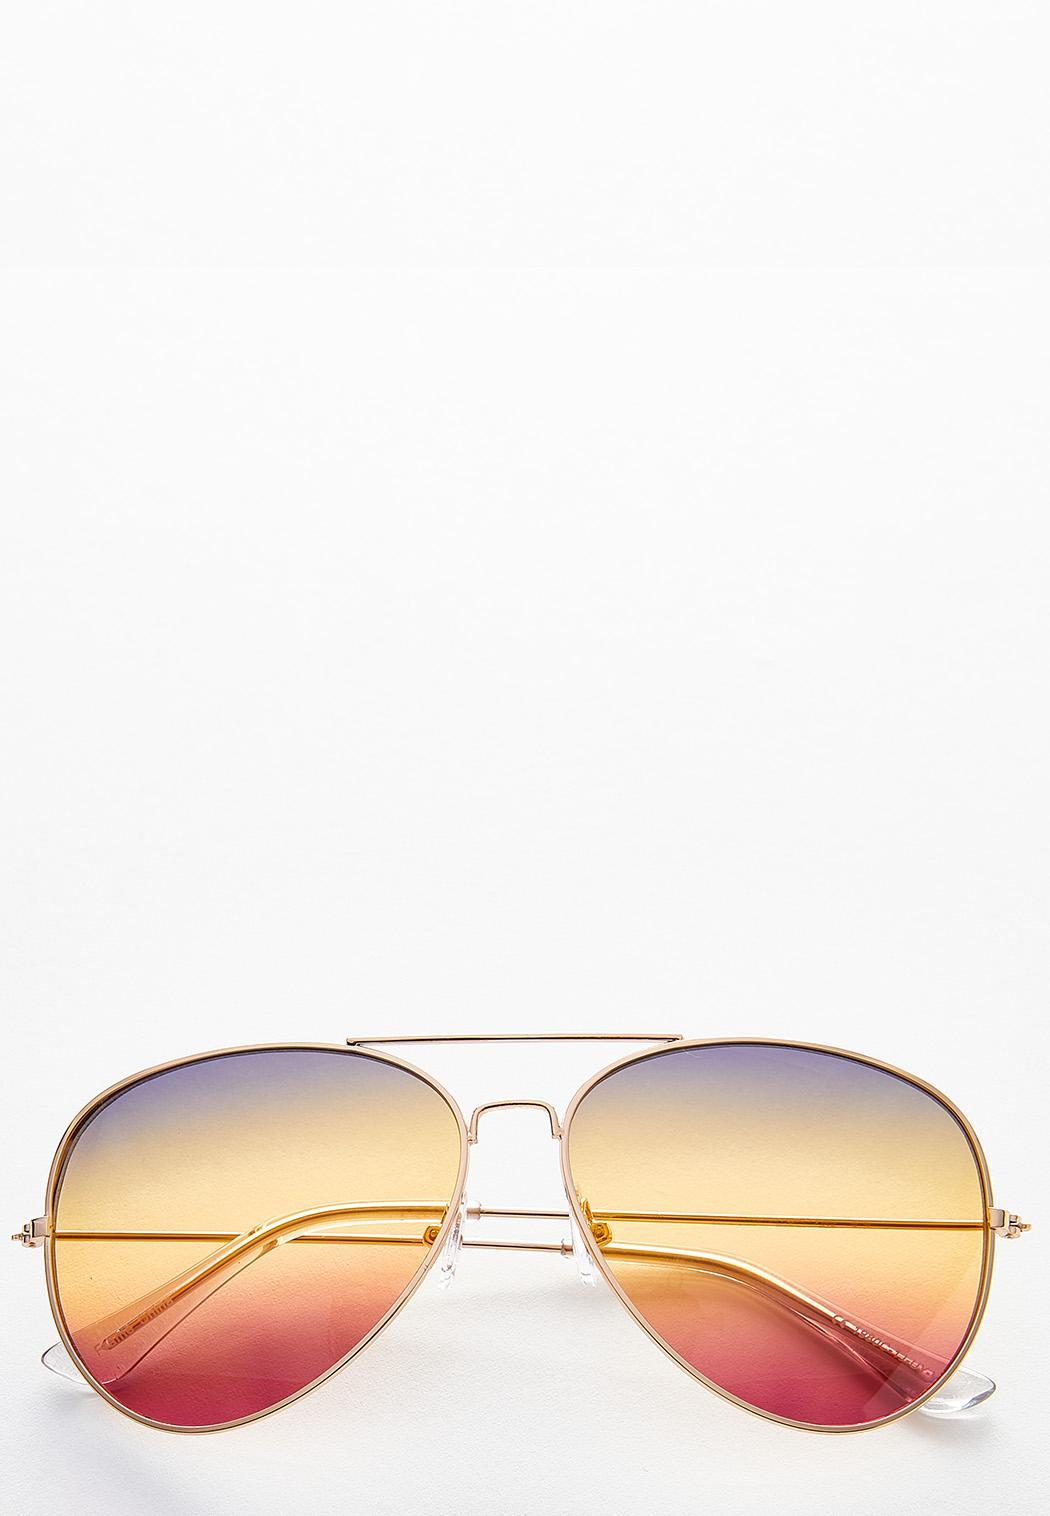 Ombre Aviator Sunglasses